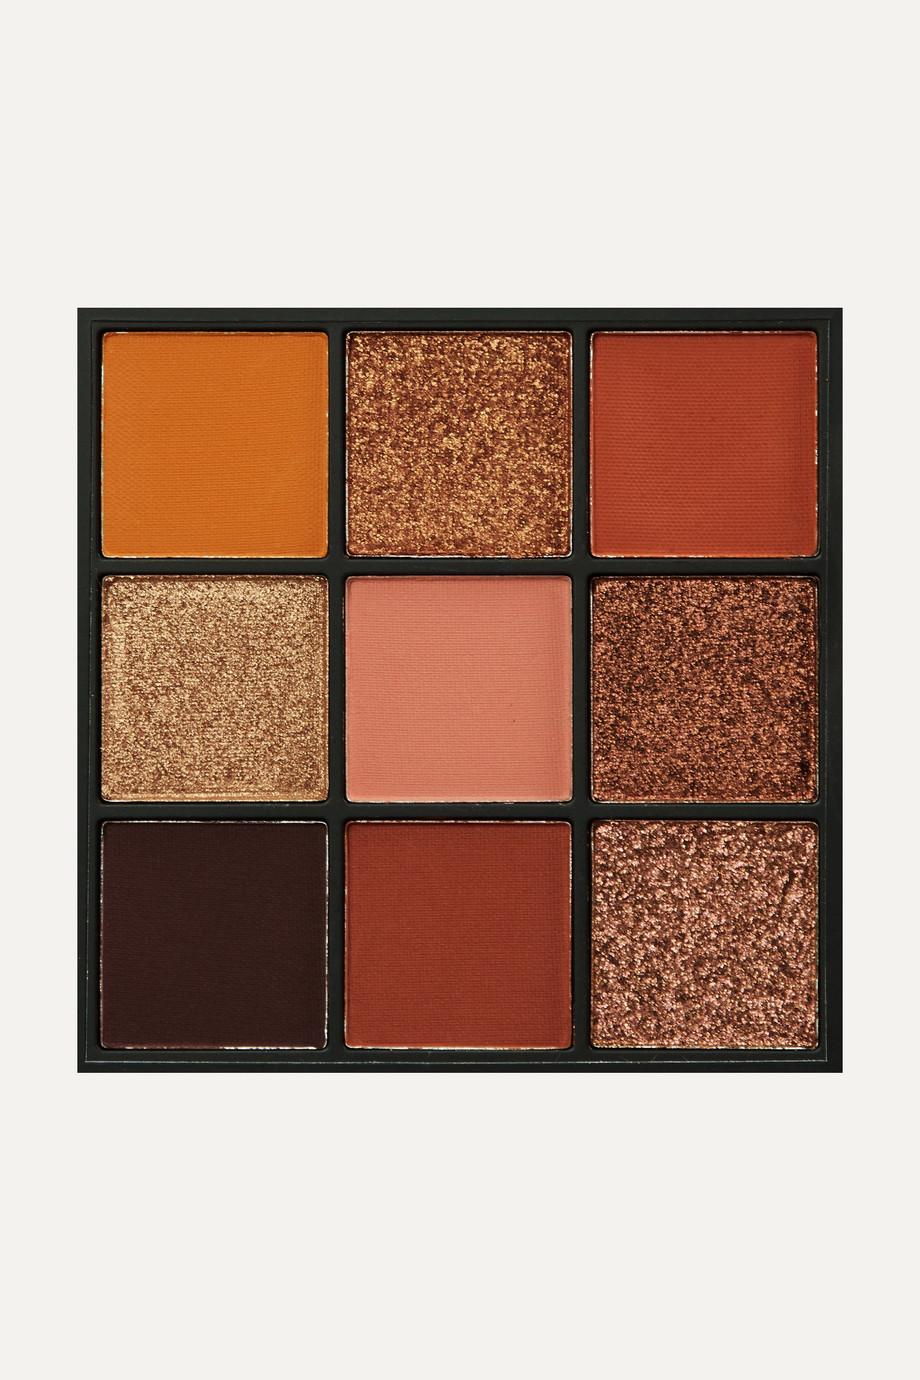 Huda Beauty Obsessions Eyeshadow Palette - Topaz